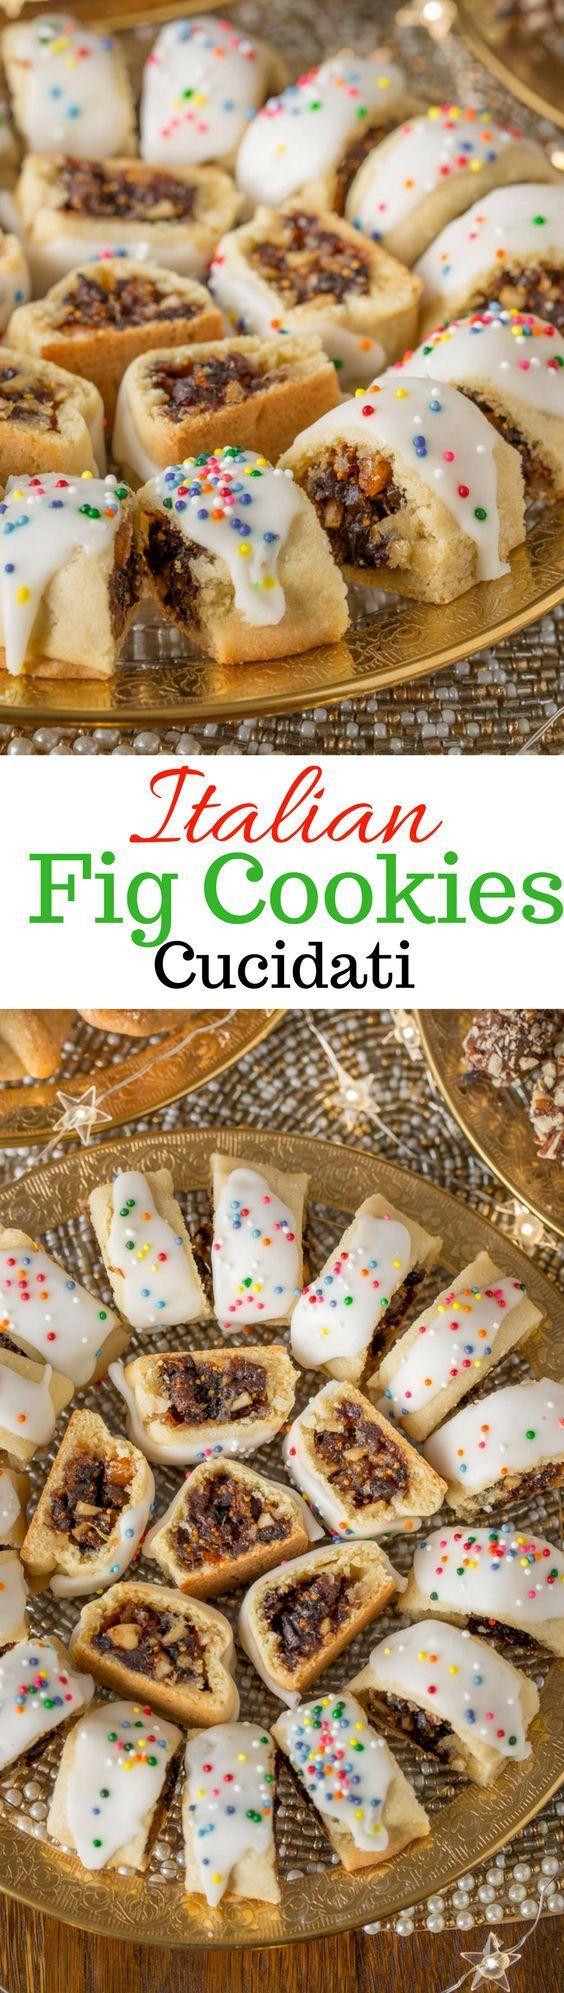 Italian Fig Cookies Cucidati Recipe Italian Fig Cookies Fig Cookies Sicilian Recipes